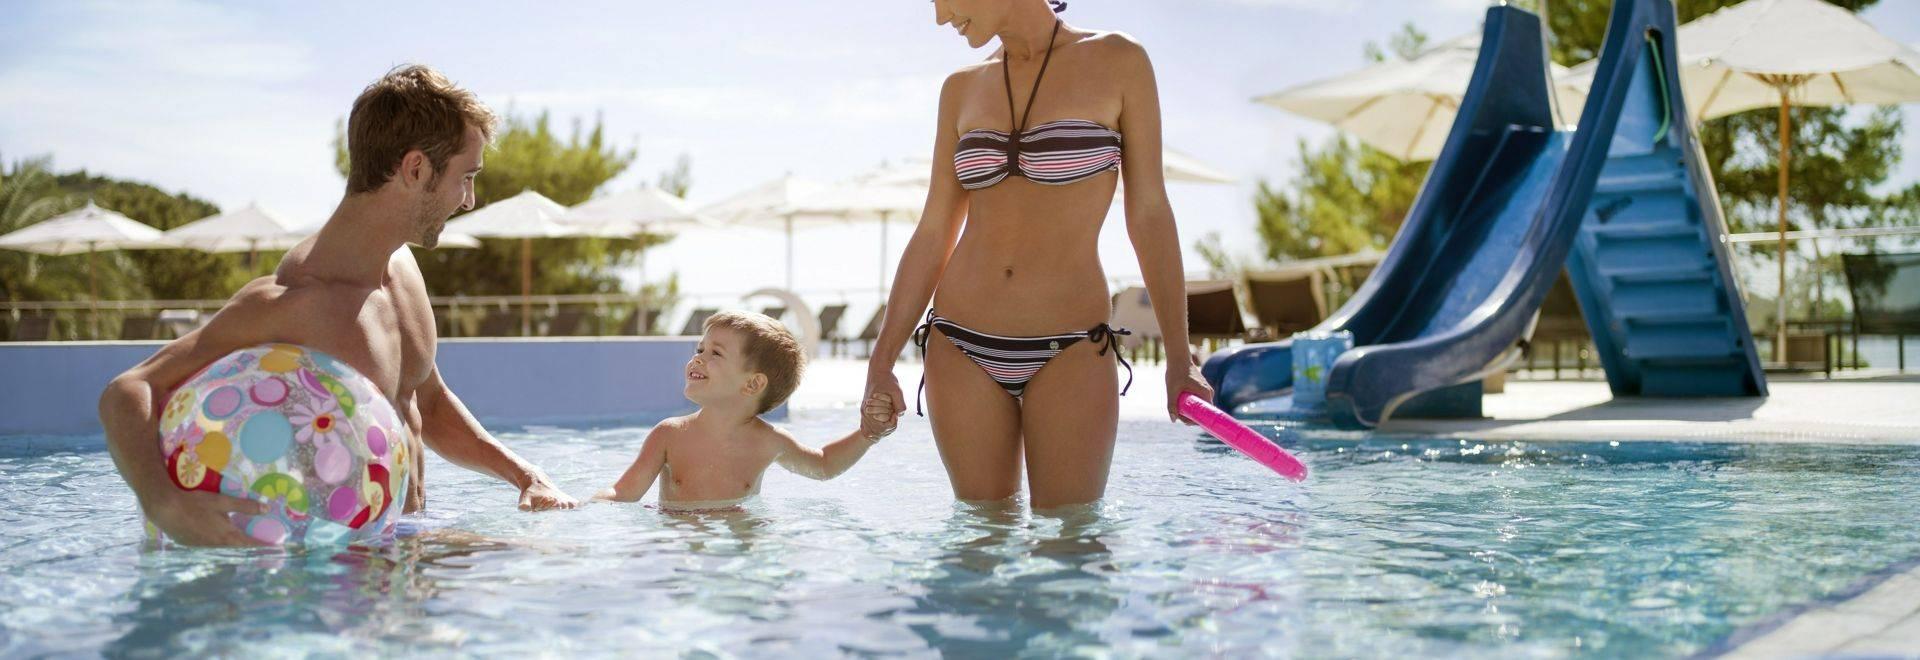 Sun-Gardens-kids-pool.jpg